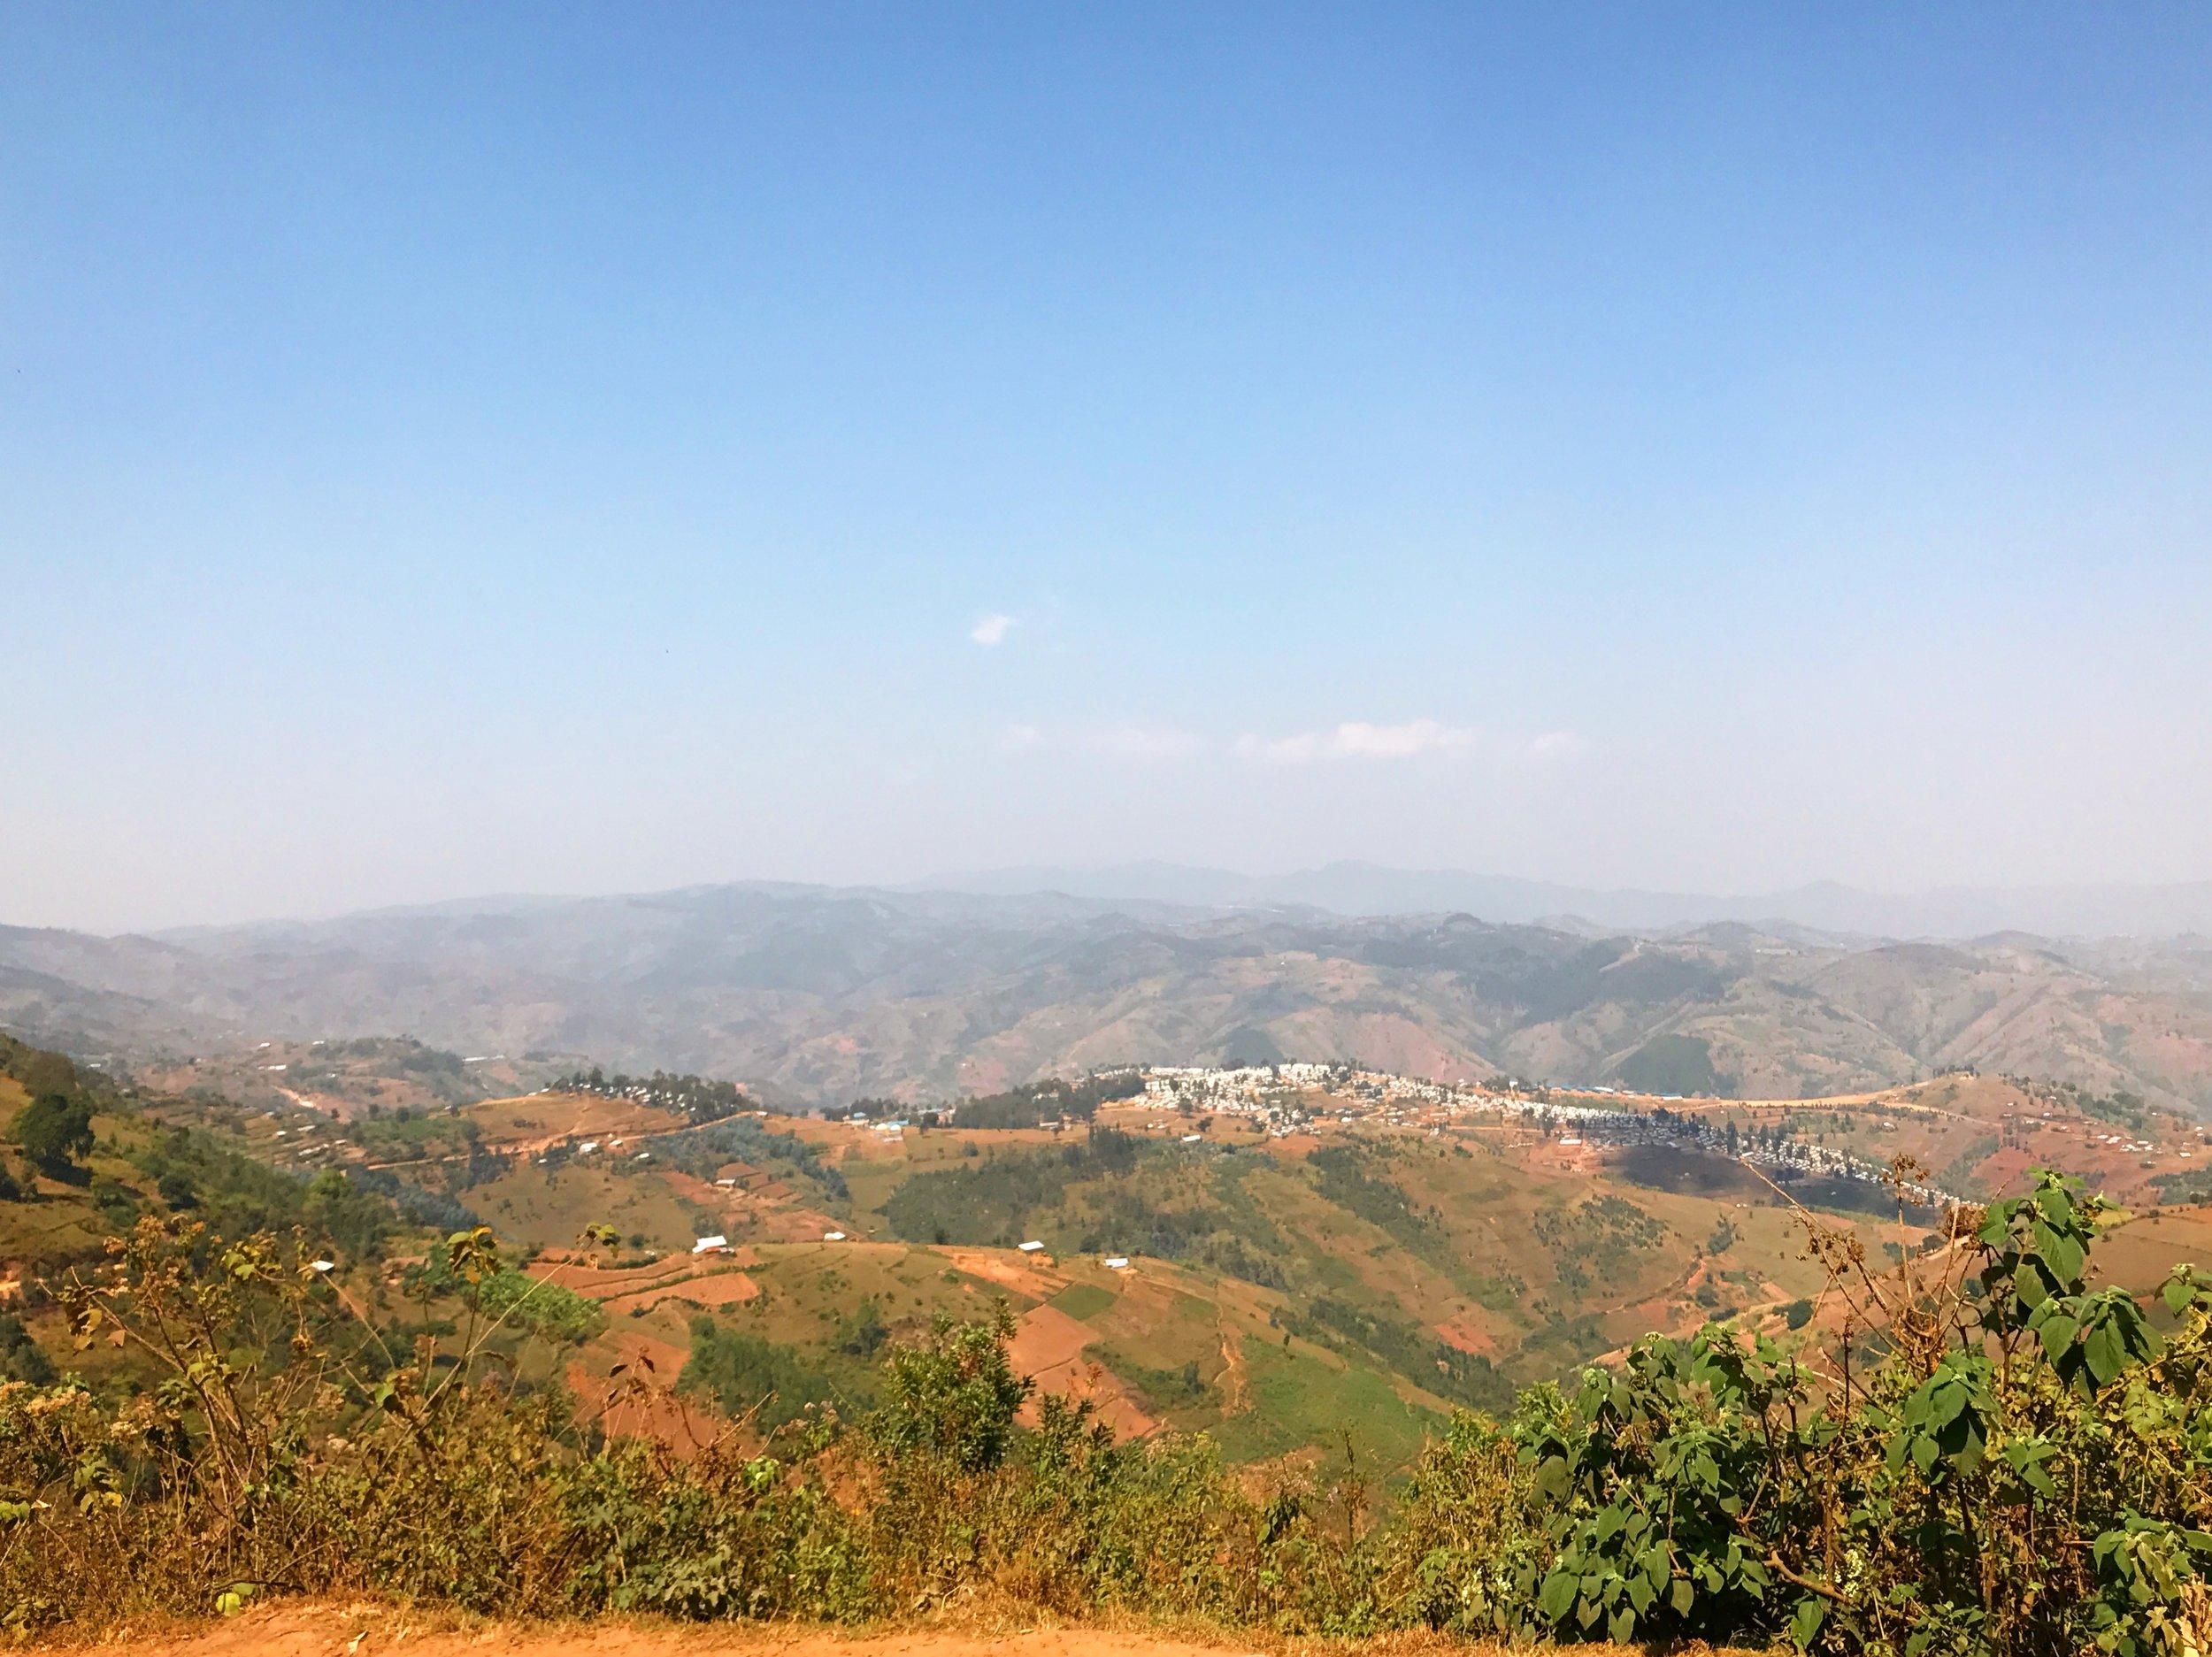 Kiziba Refugee Camp, Rwanda